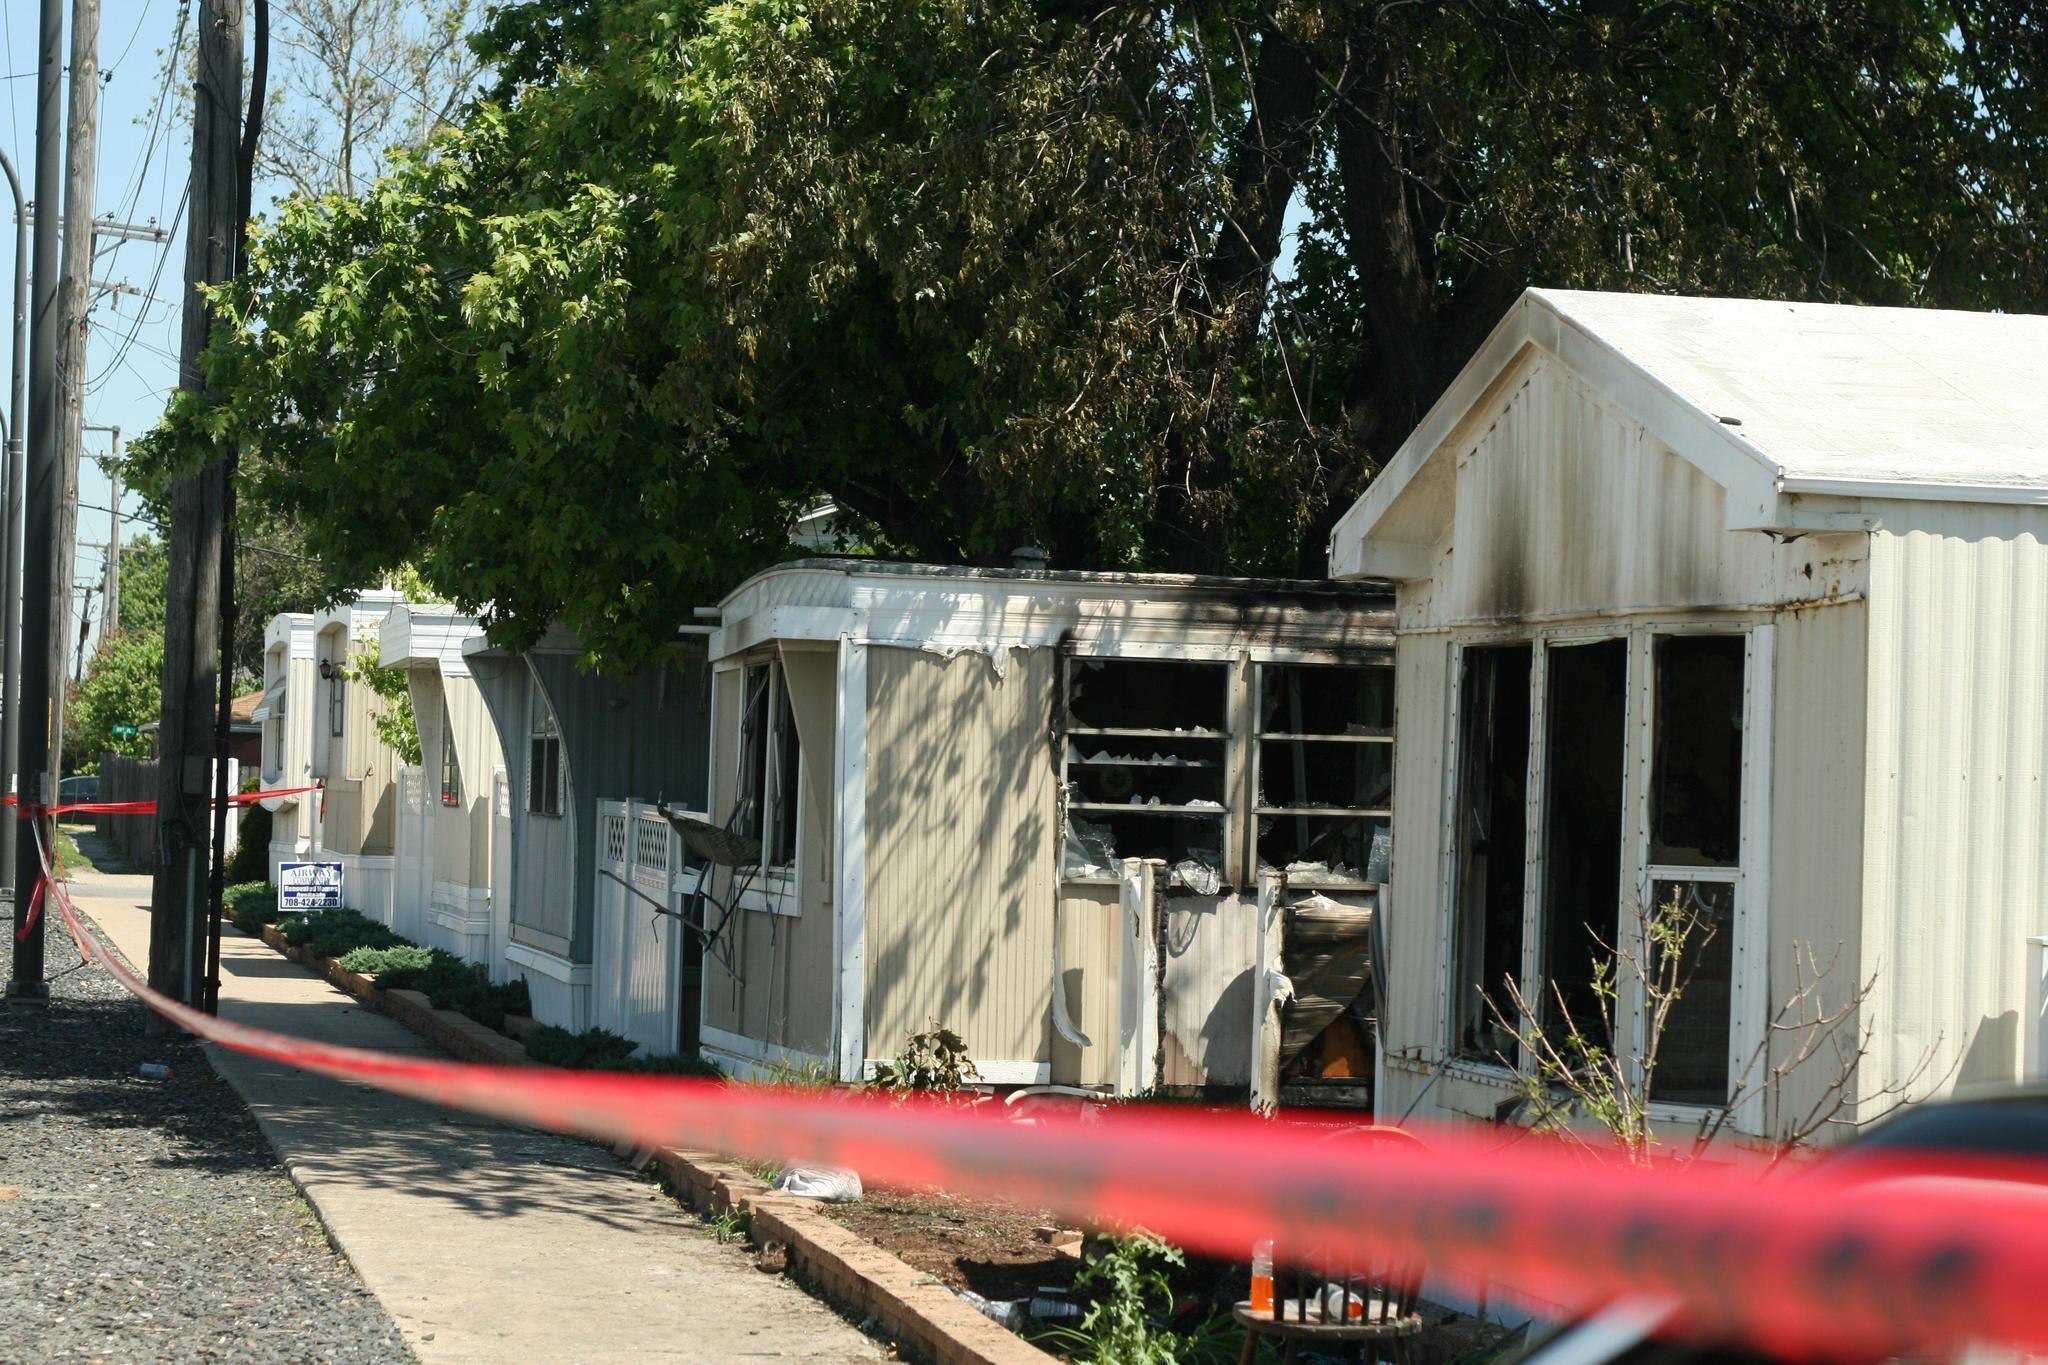 Oak Lawn Mobile Home Park Fearful After Fatal Fire